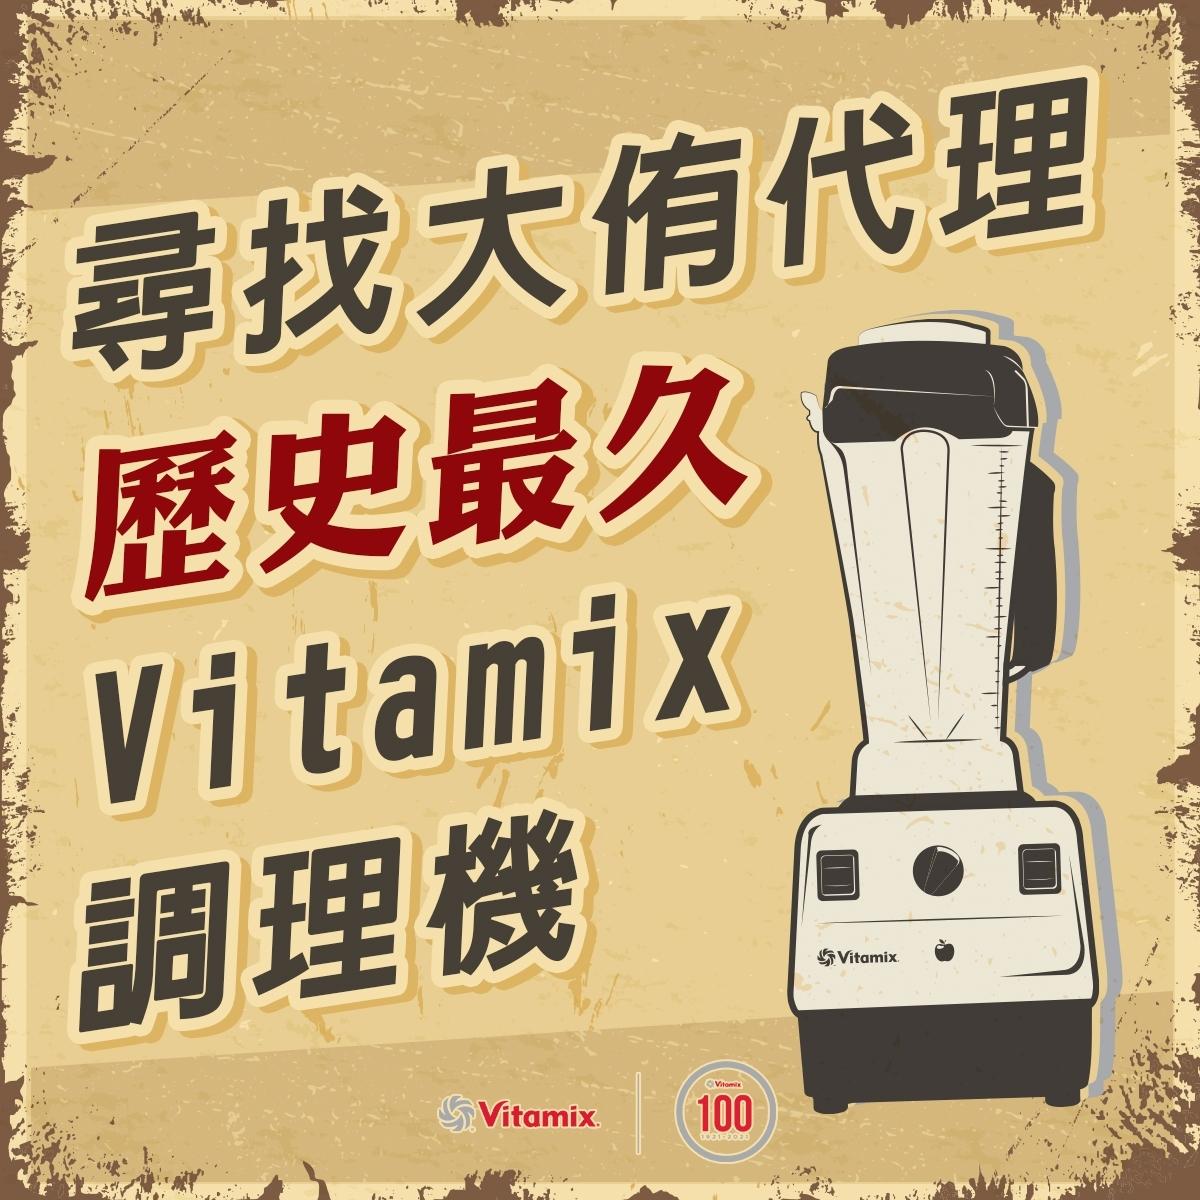 Vitamix調理機-陳月卿-甜點-冰沙-冰淇淋-綠拿鐵-濃湯-芝麻醬-精力湯-Vitamix 大侑尋根-小蘋果機-老顧客回饋